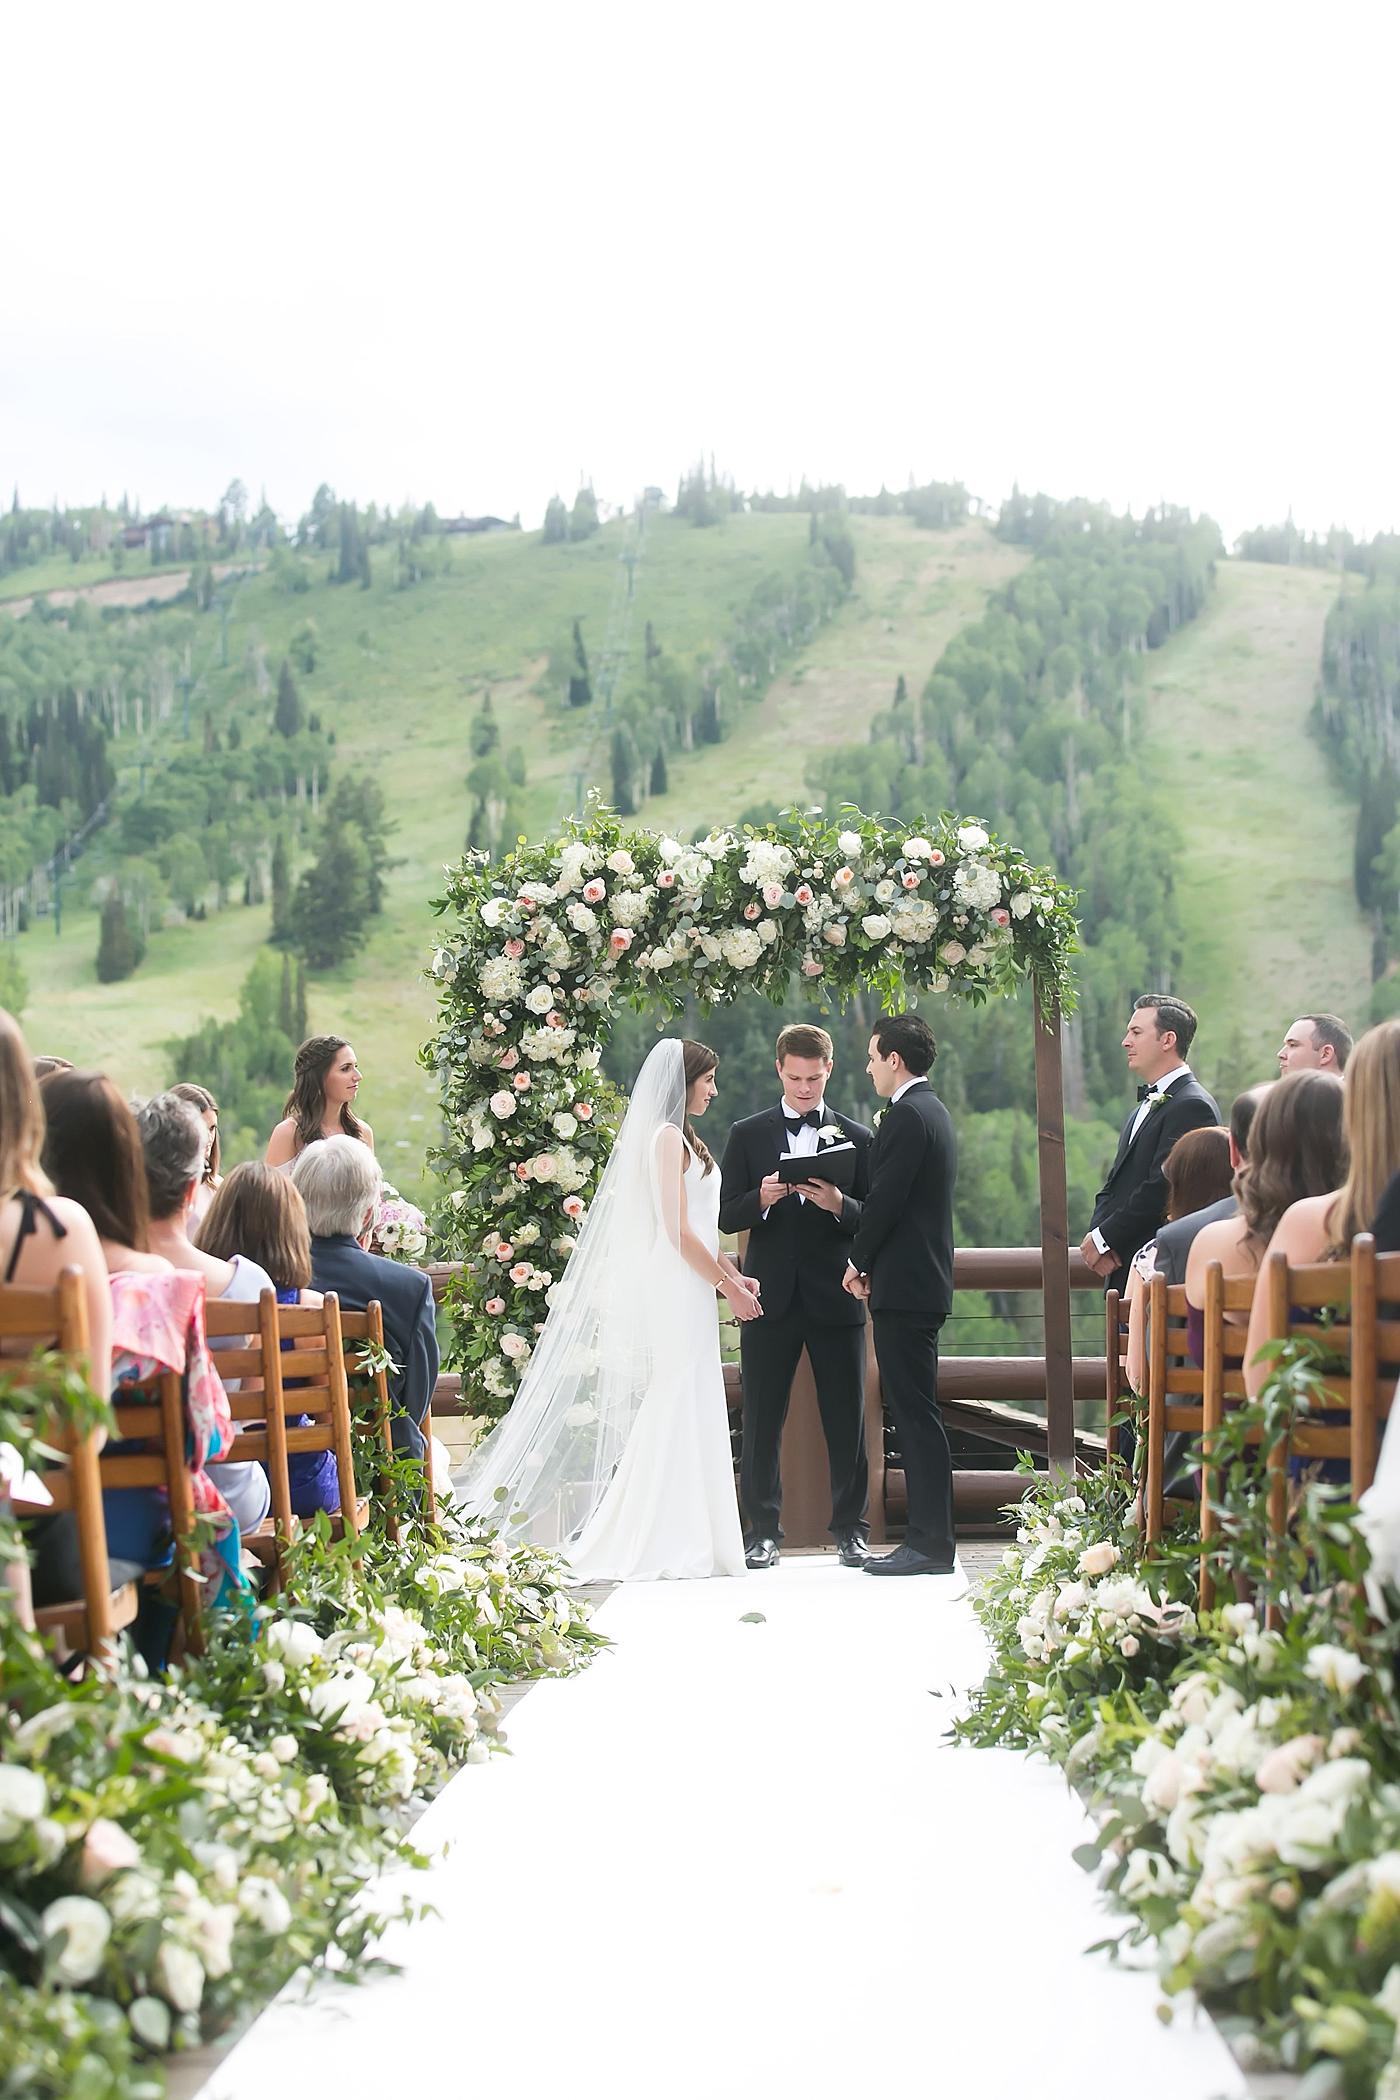 Romantic Mountain Wedding_Deer Valley Weddings_Park City Wedding Planner_MelissaFancy_0096.jpg